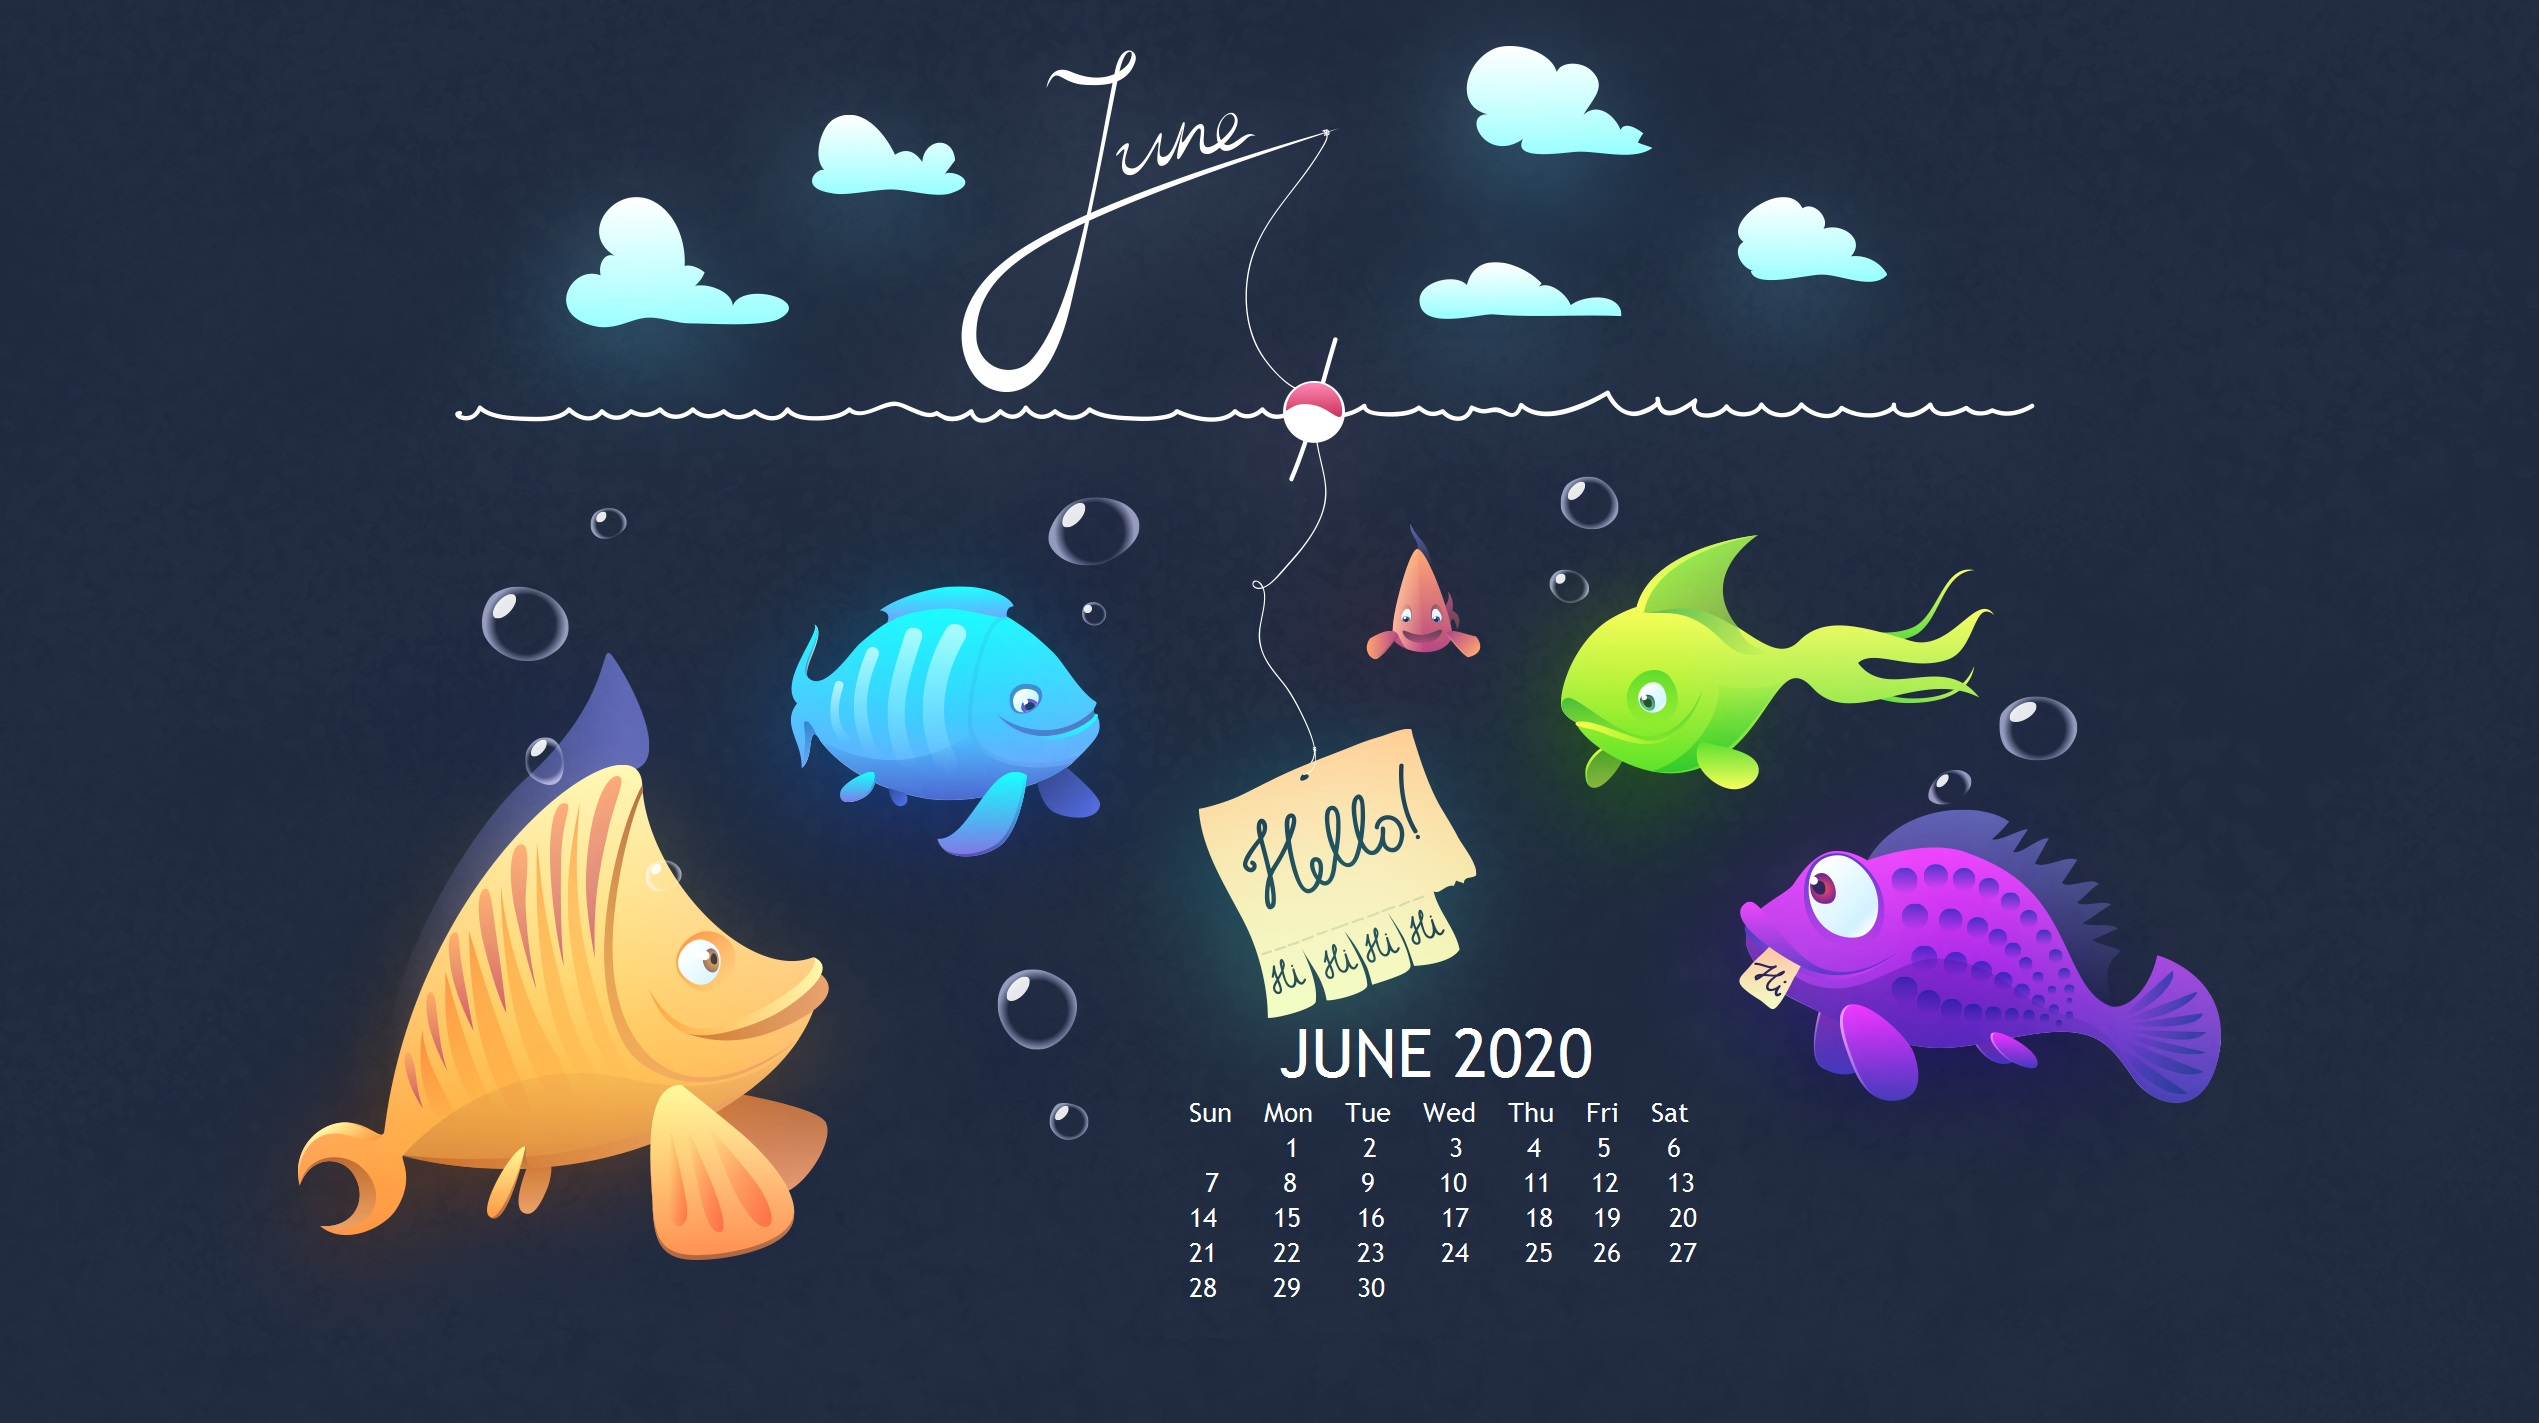 Cute June 2020 Wallpaper